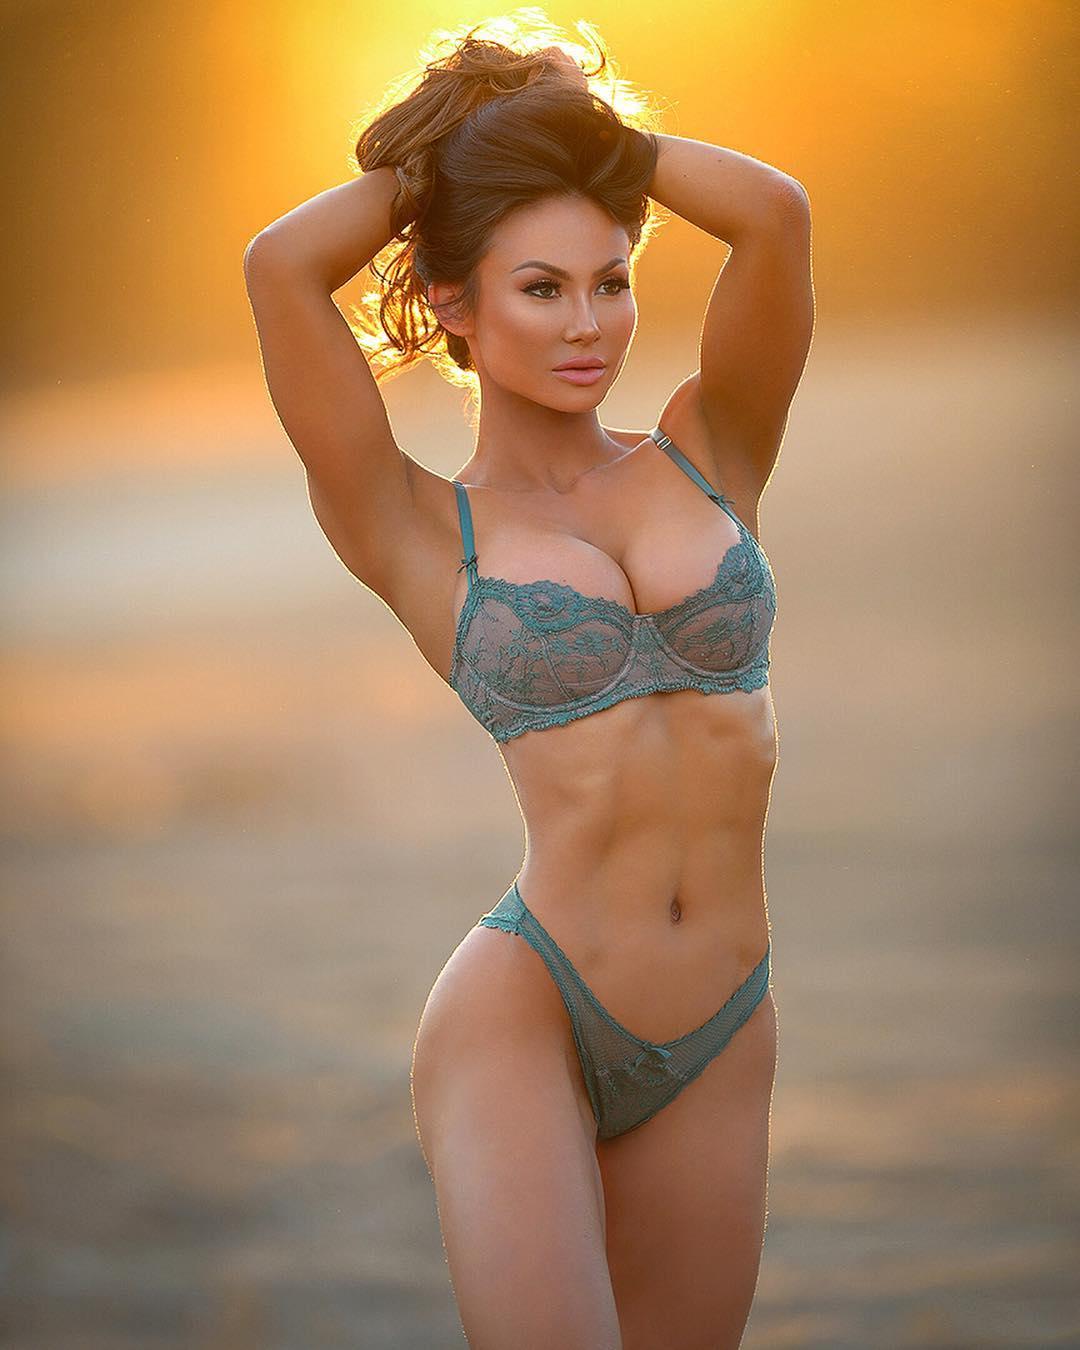 Американская фитнес модель - красотка Michie Peachie